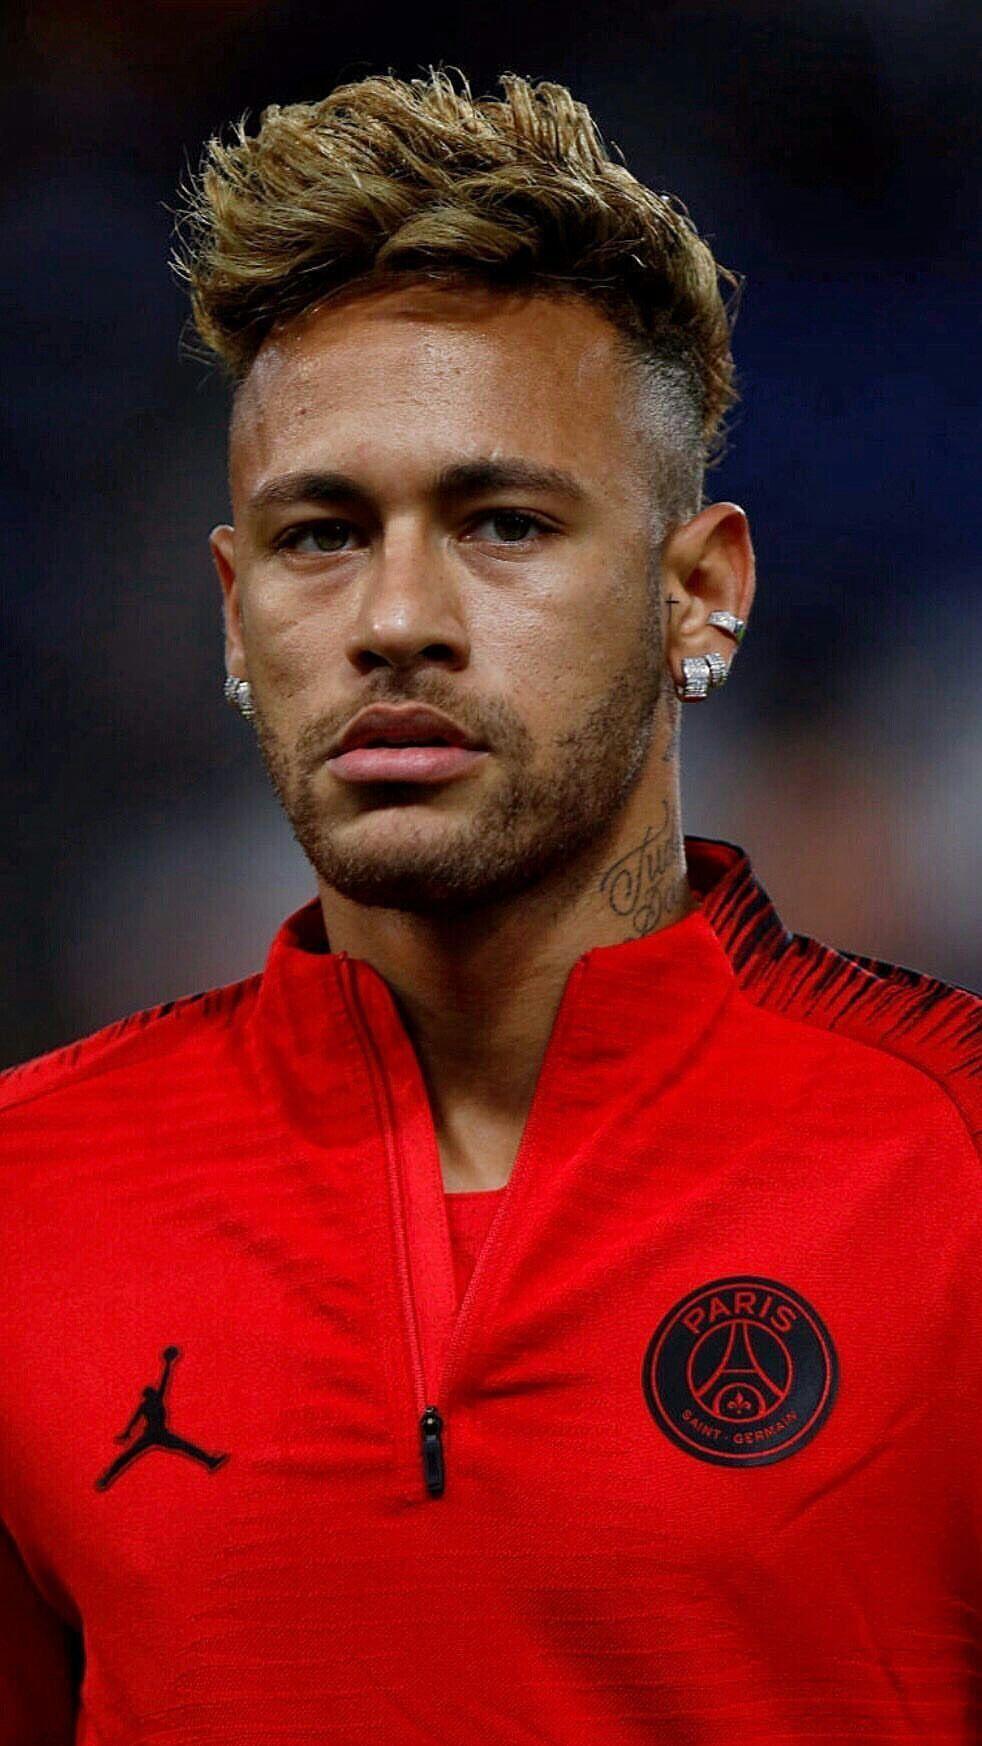 Pin by Marianna on NEYMAR JR!!   Neymar jr, Neymar, Neymar